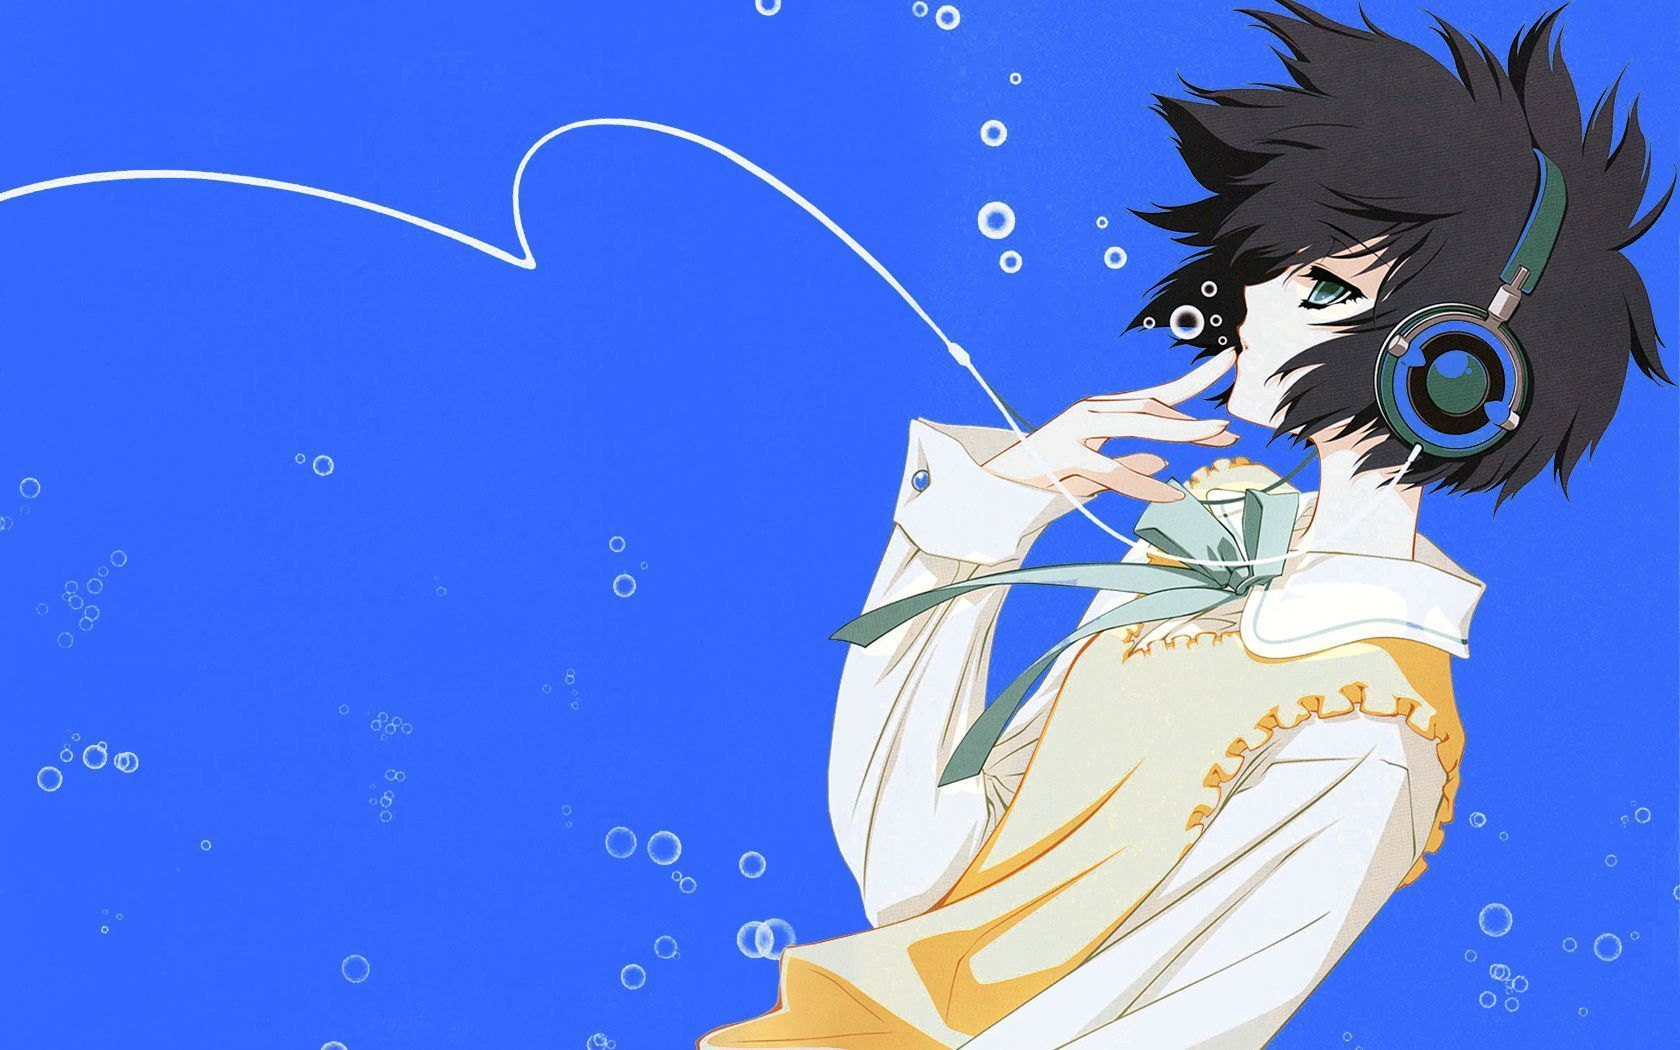 Anime Headphones Wallpapers Hd Widescreen Photo Anime Character With Headphones 1680x1050 Wallpaper Teahub Io